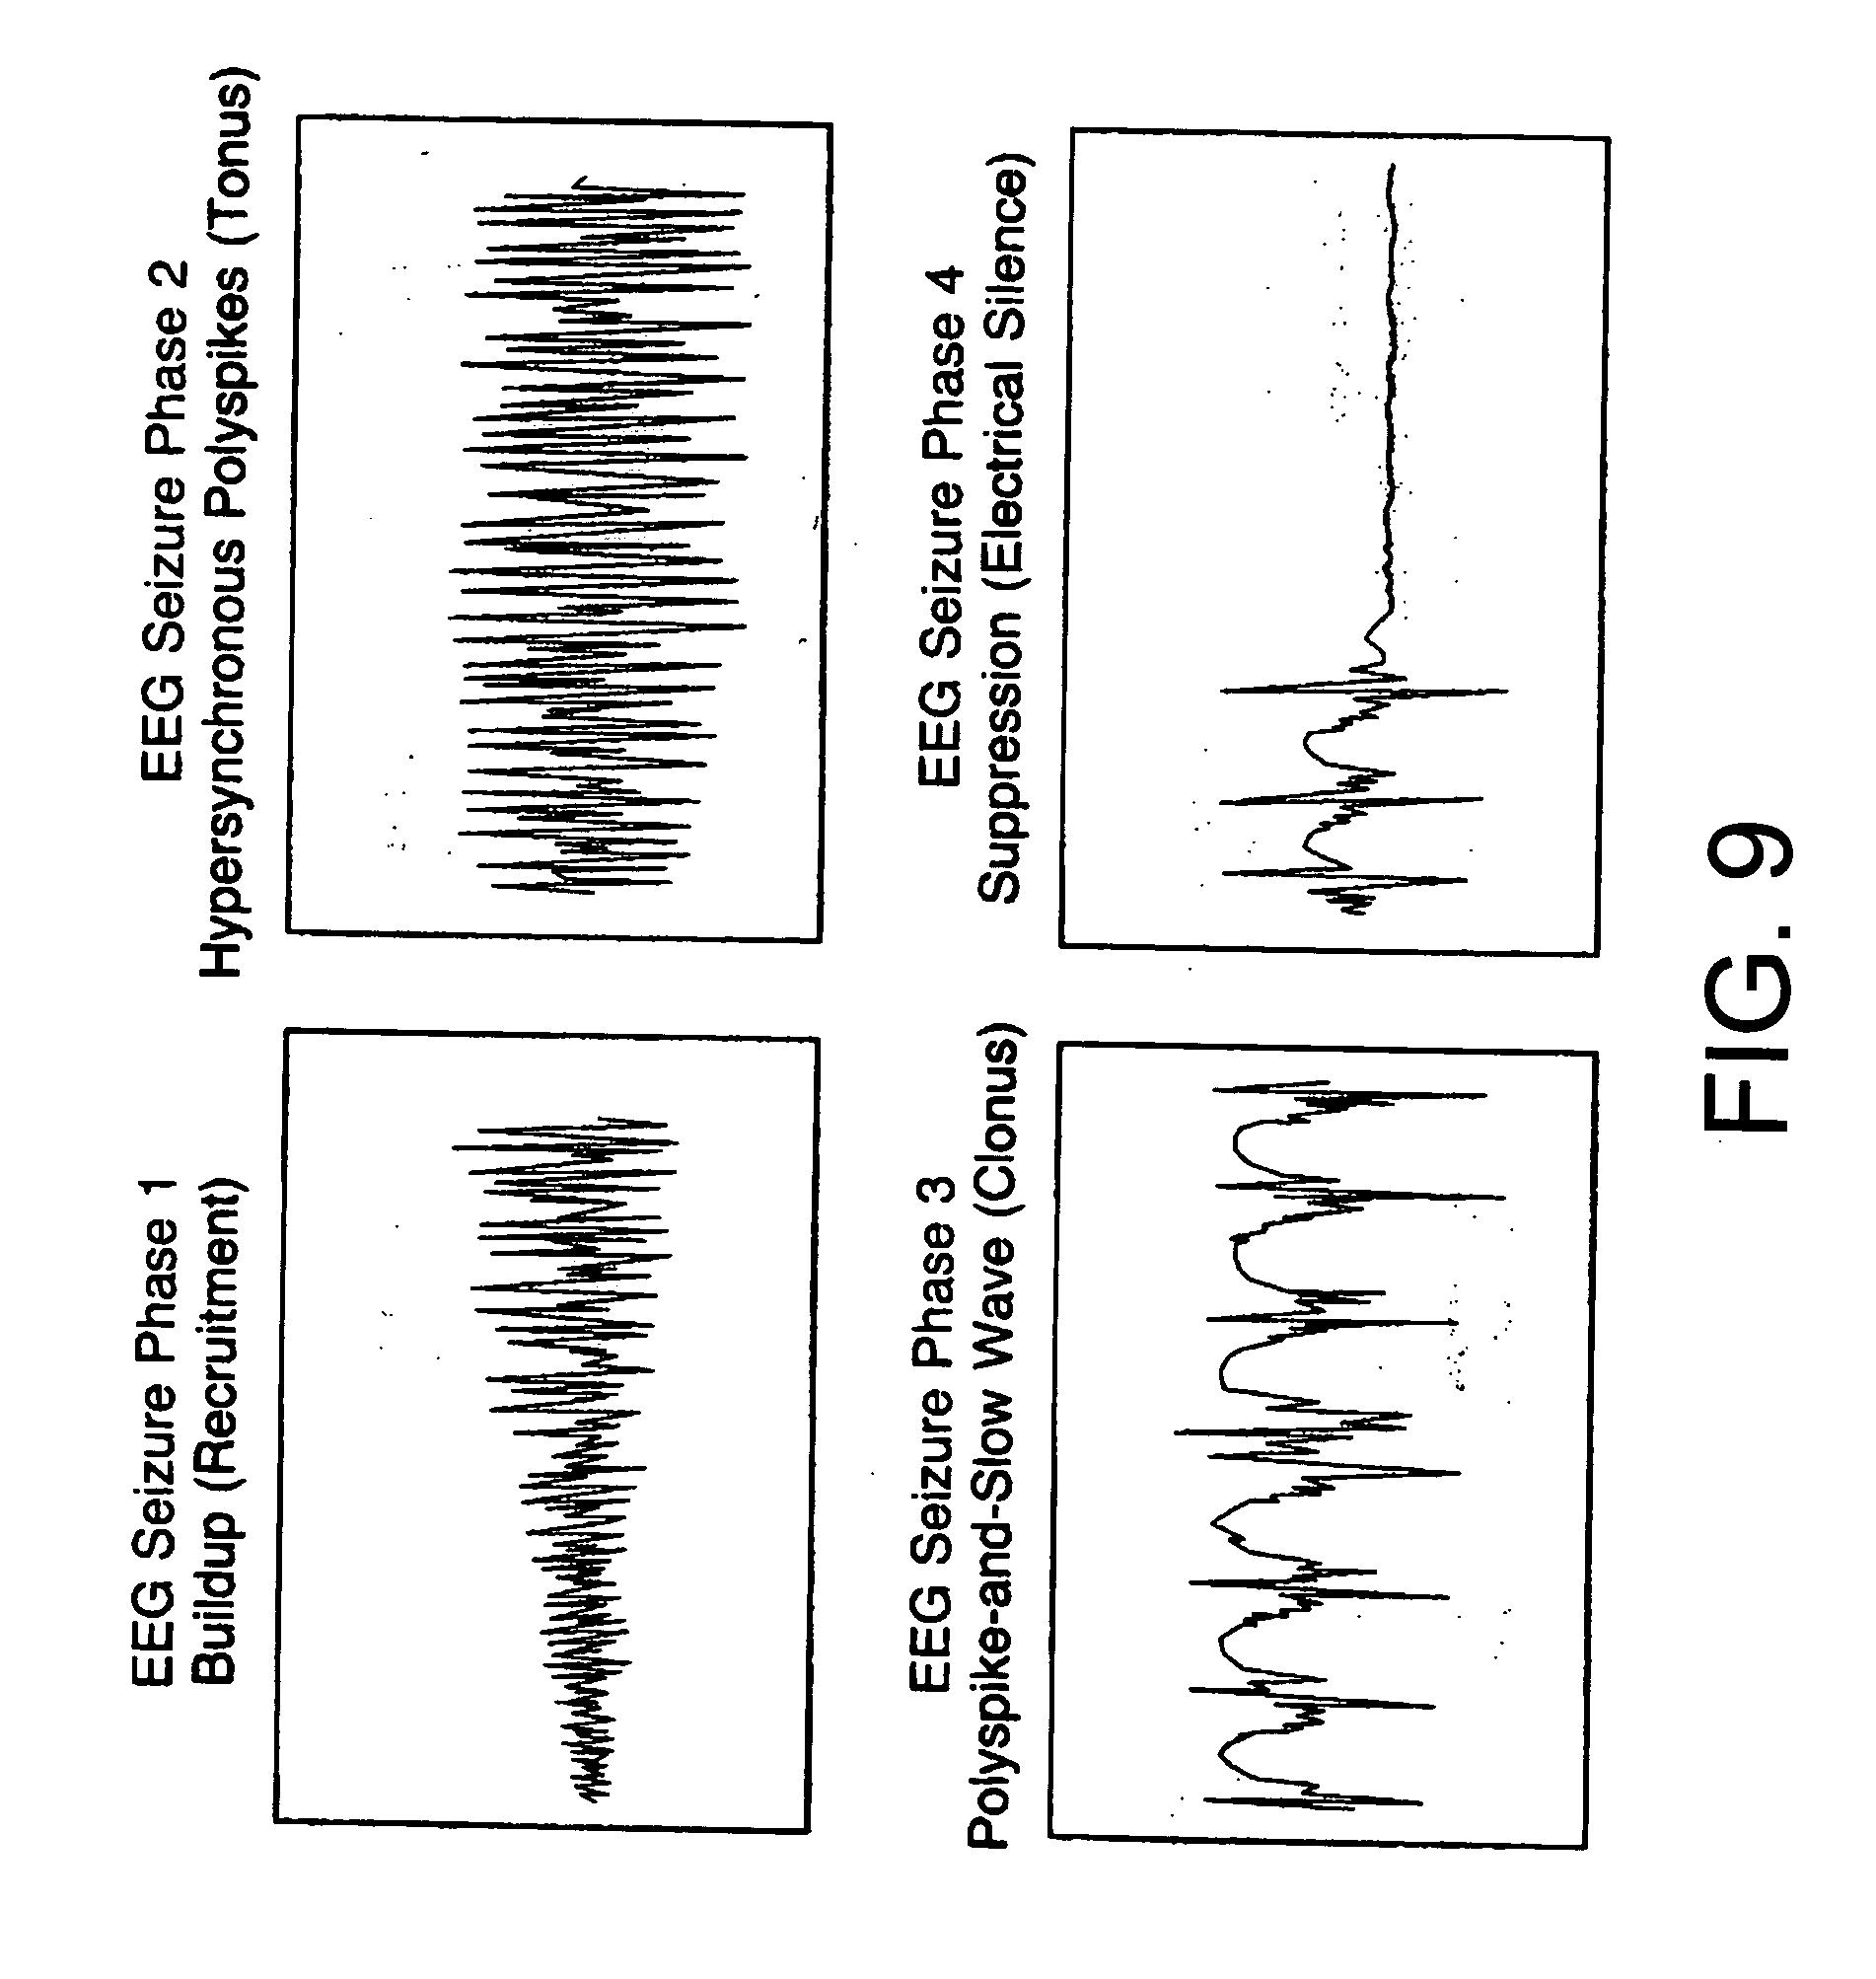 electroconvulsive therapy for depression pdf